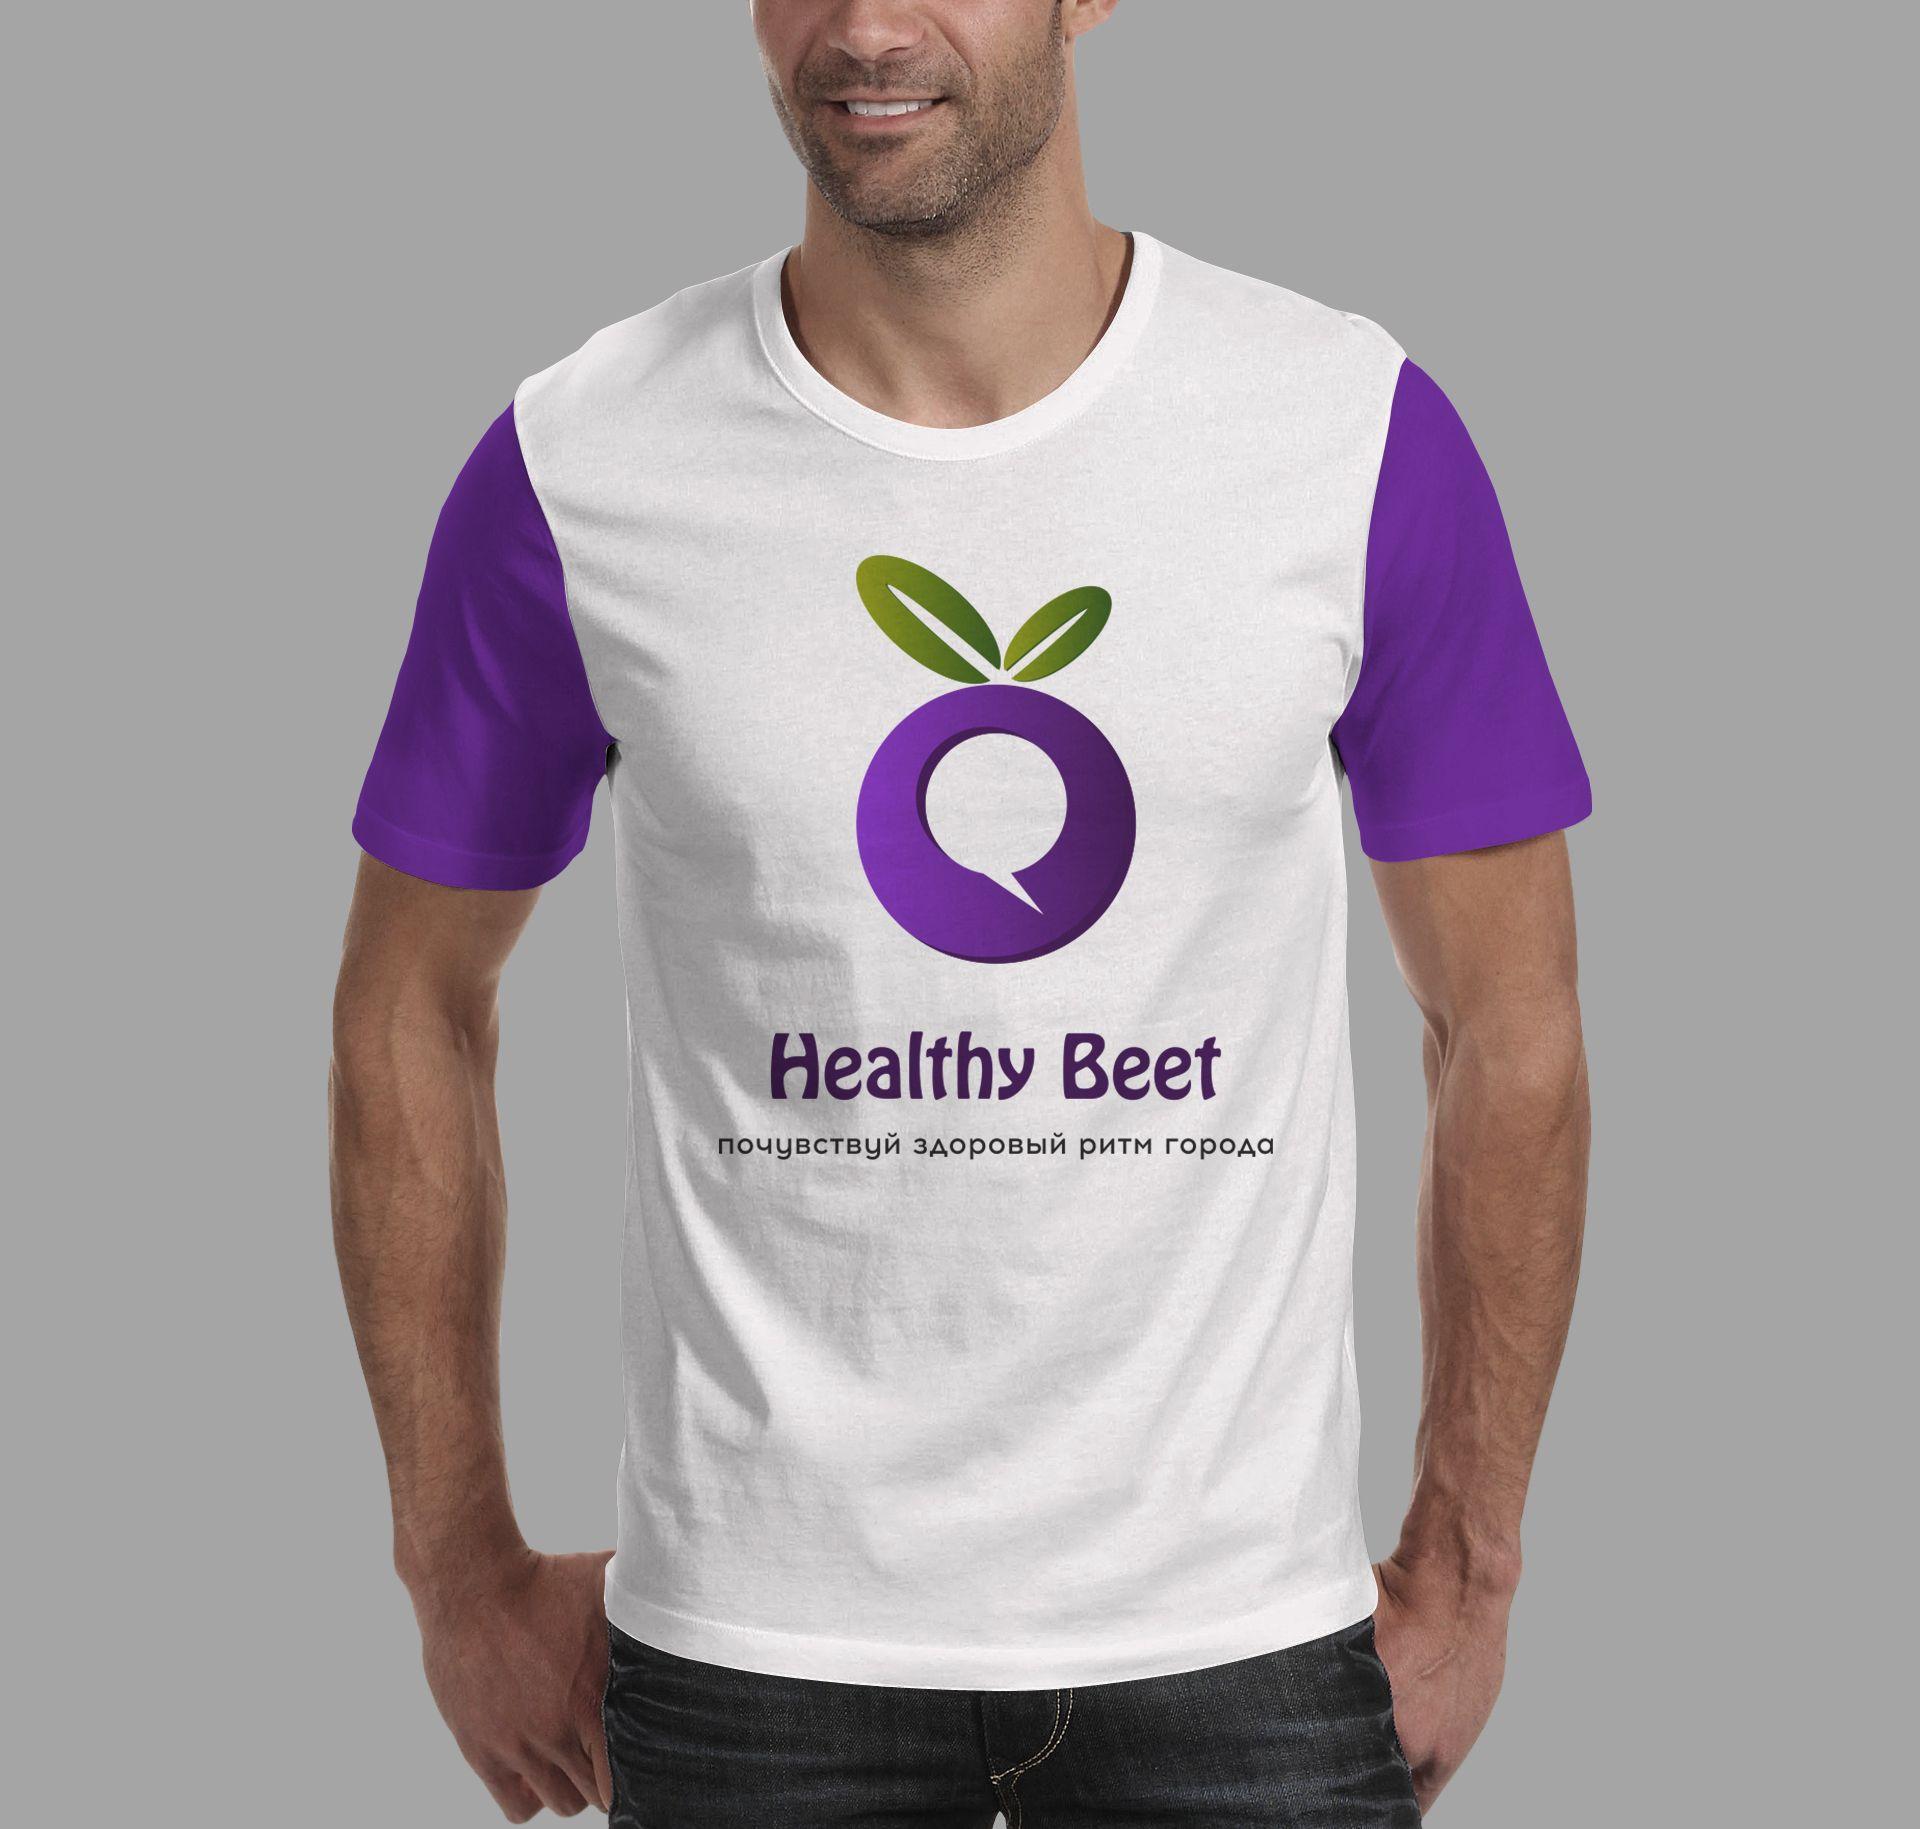 Healthy Bit или Healthy Beet - дизайнер Lepata